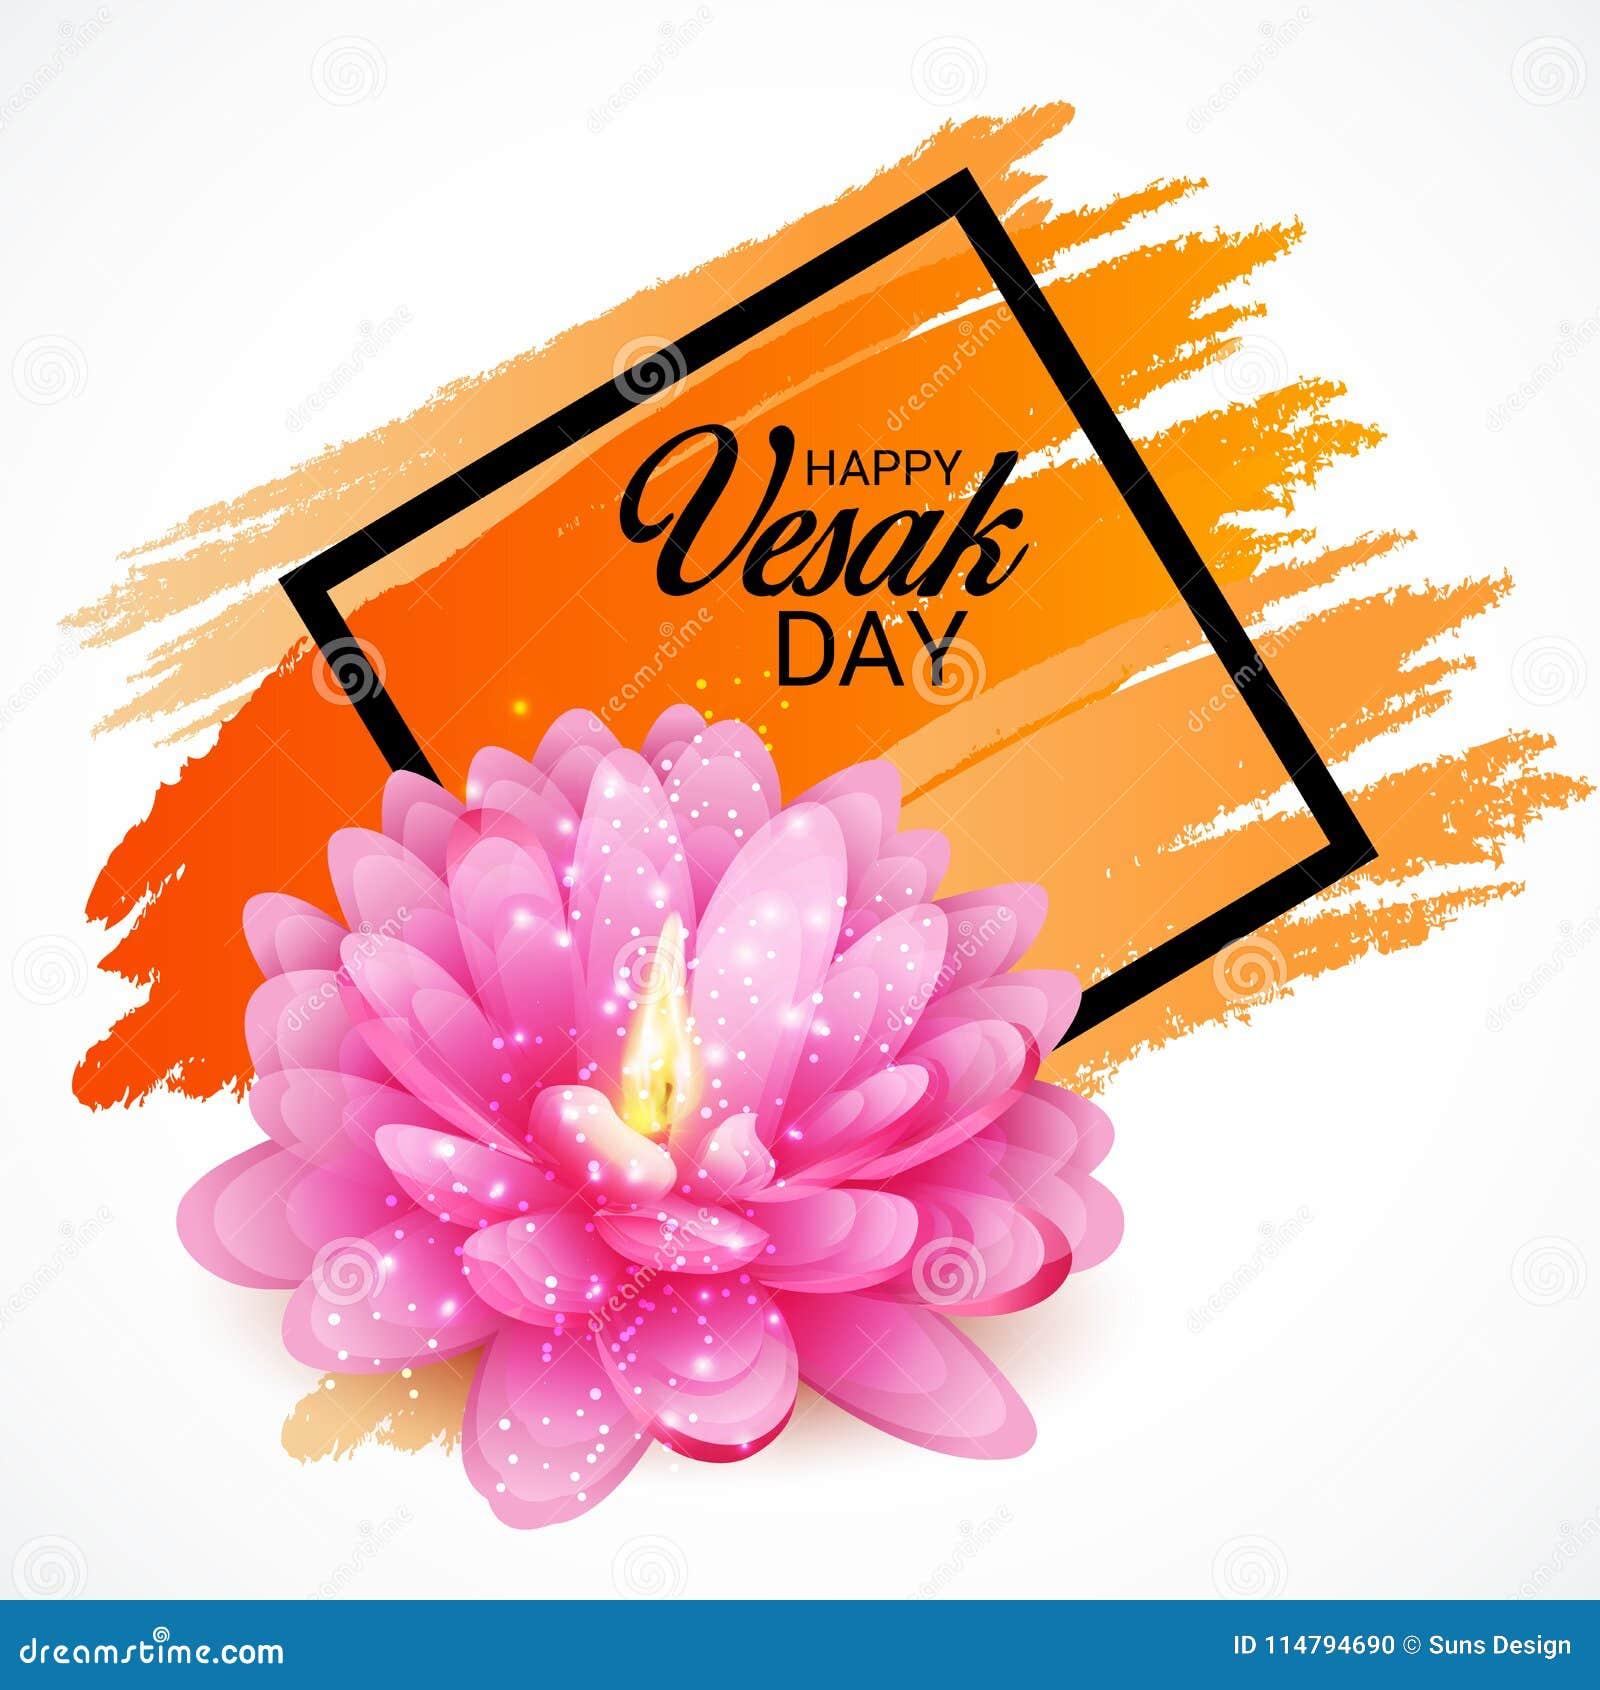 Vesak Day With Pink Lotus Flower Stock Illustration Illustration